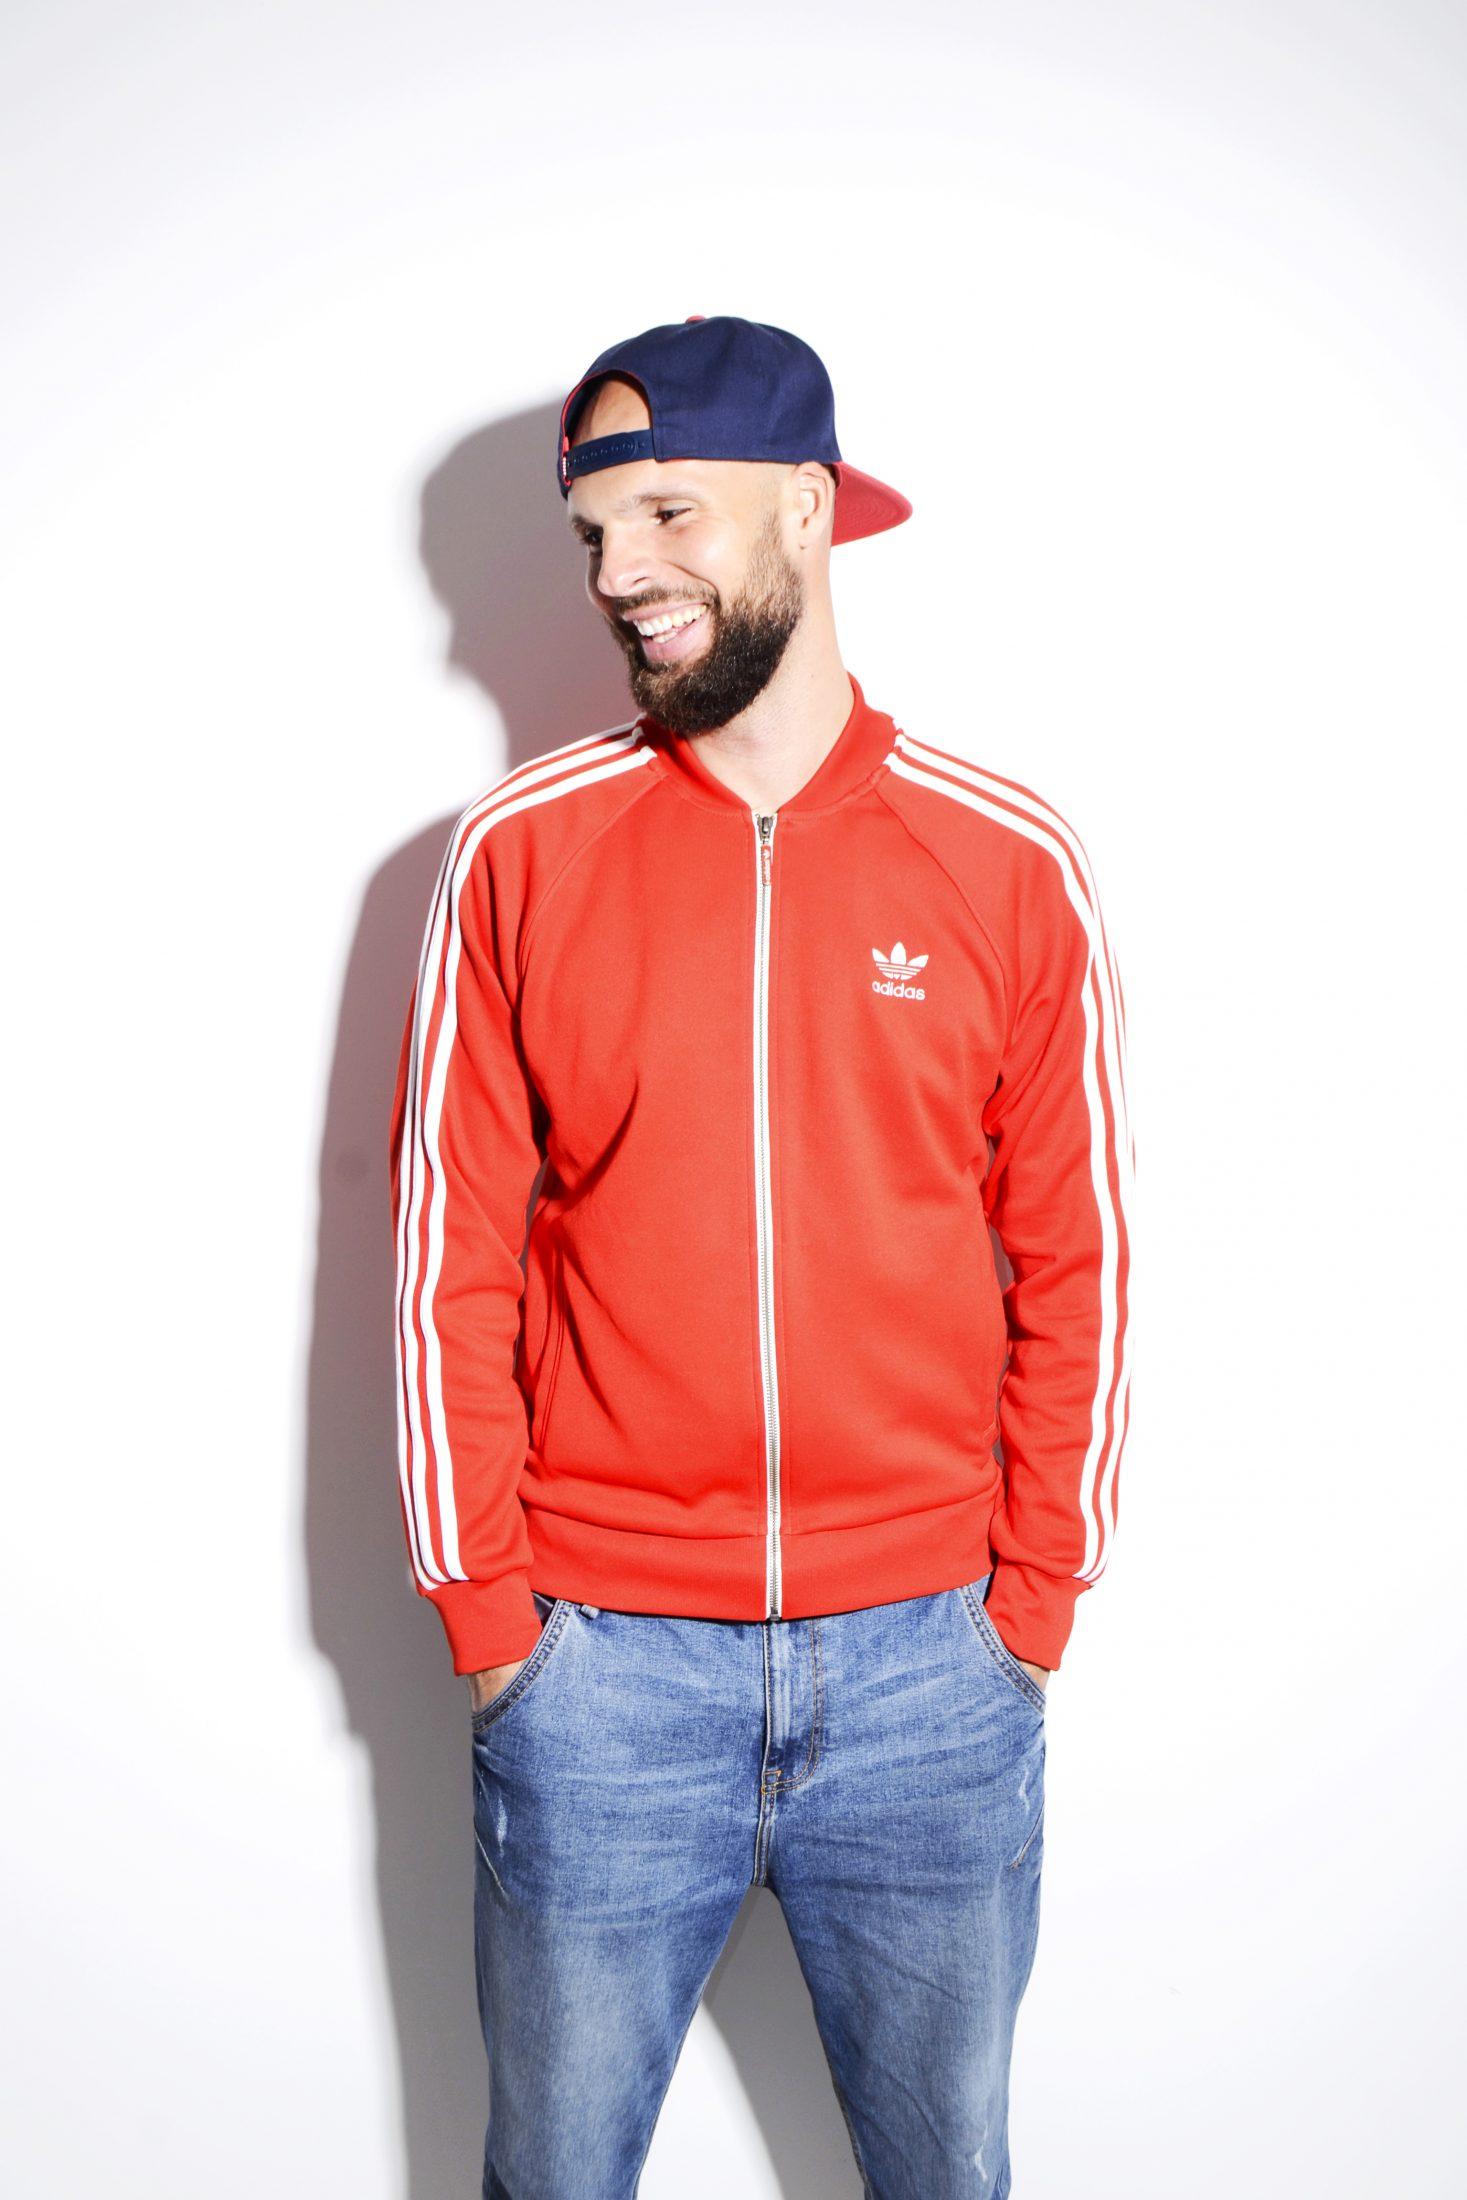 b89c52f2 Adidas Originals Superstar Track Jacket   HOT MILK vintage clothes ...